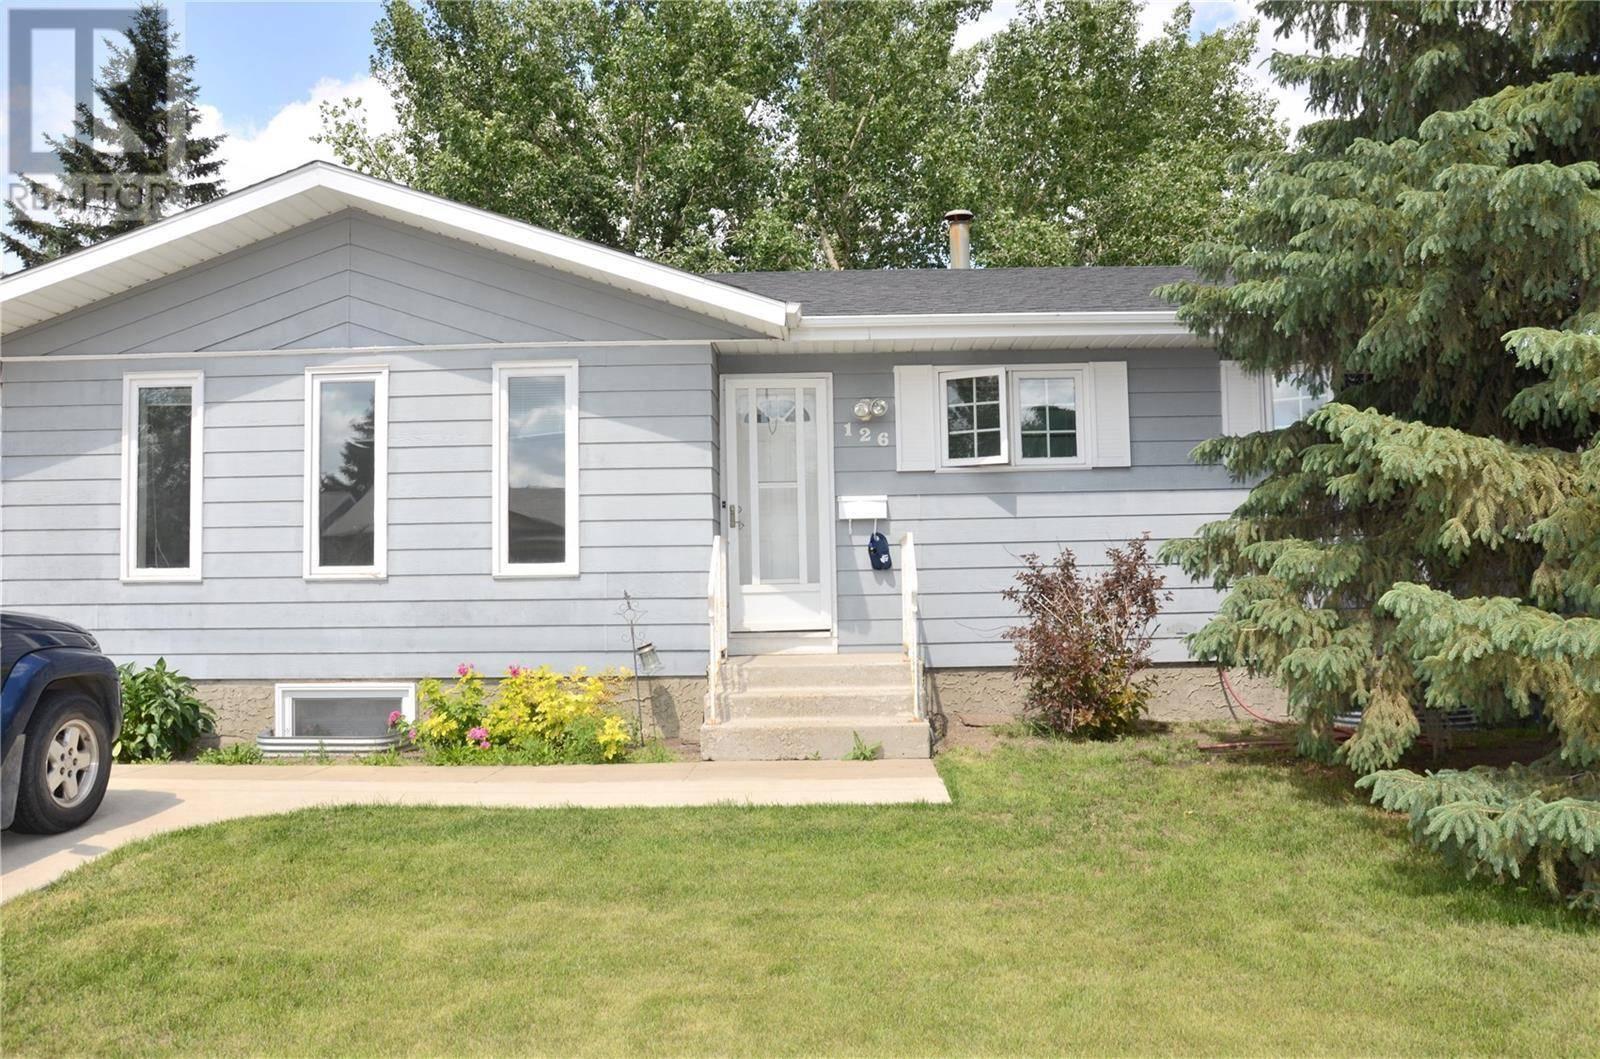 House for sale at 126 Adilman Dr Saskatoon Saskatchewan - MLS: SK778876